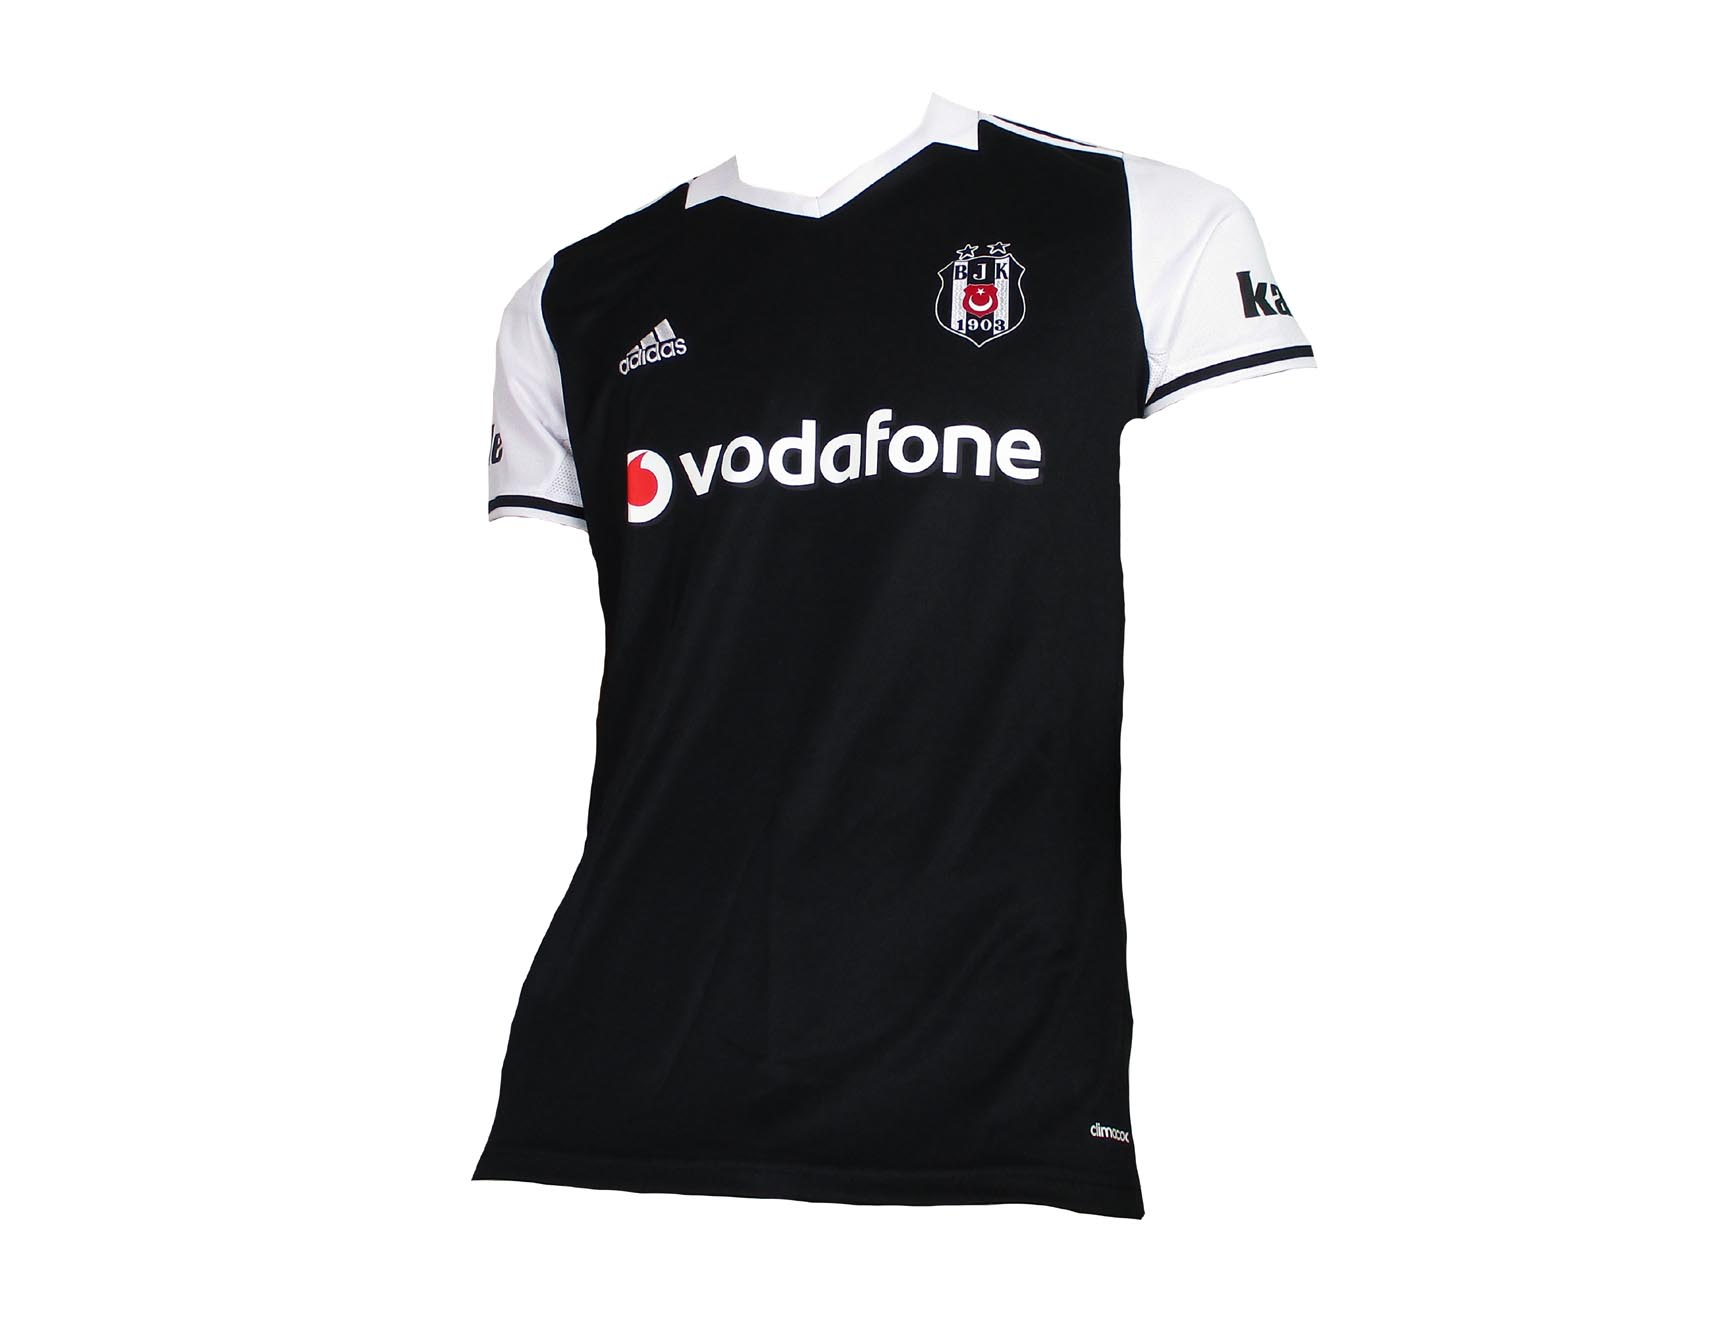 Detalles De Estambul Jersey Camisa Camiseta Ver 201617 Adidas Original Away Título Besiktas Maillot JluKF3T1c